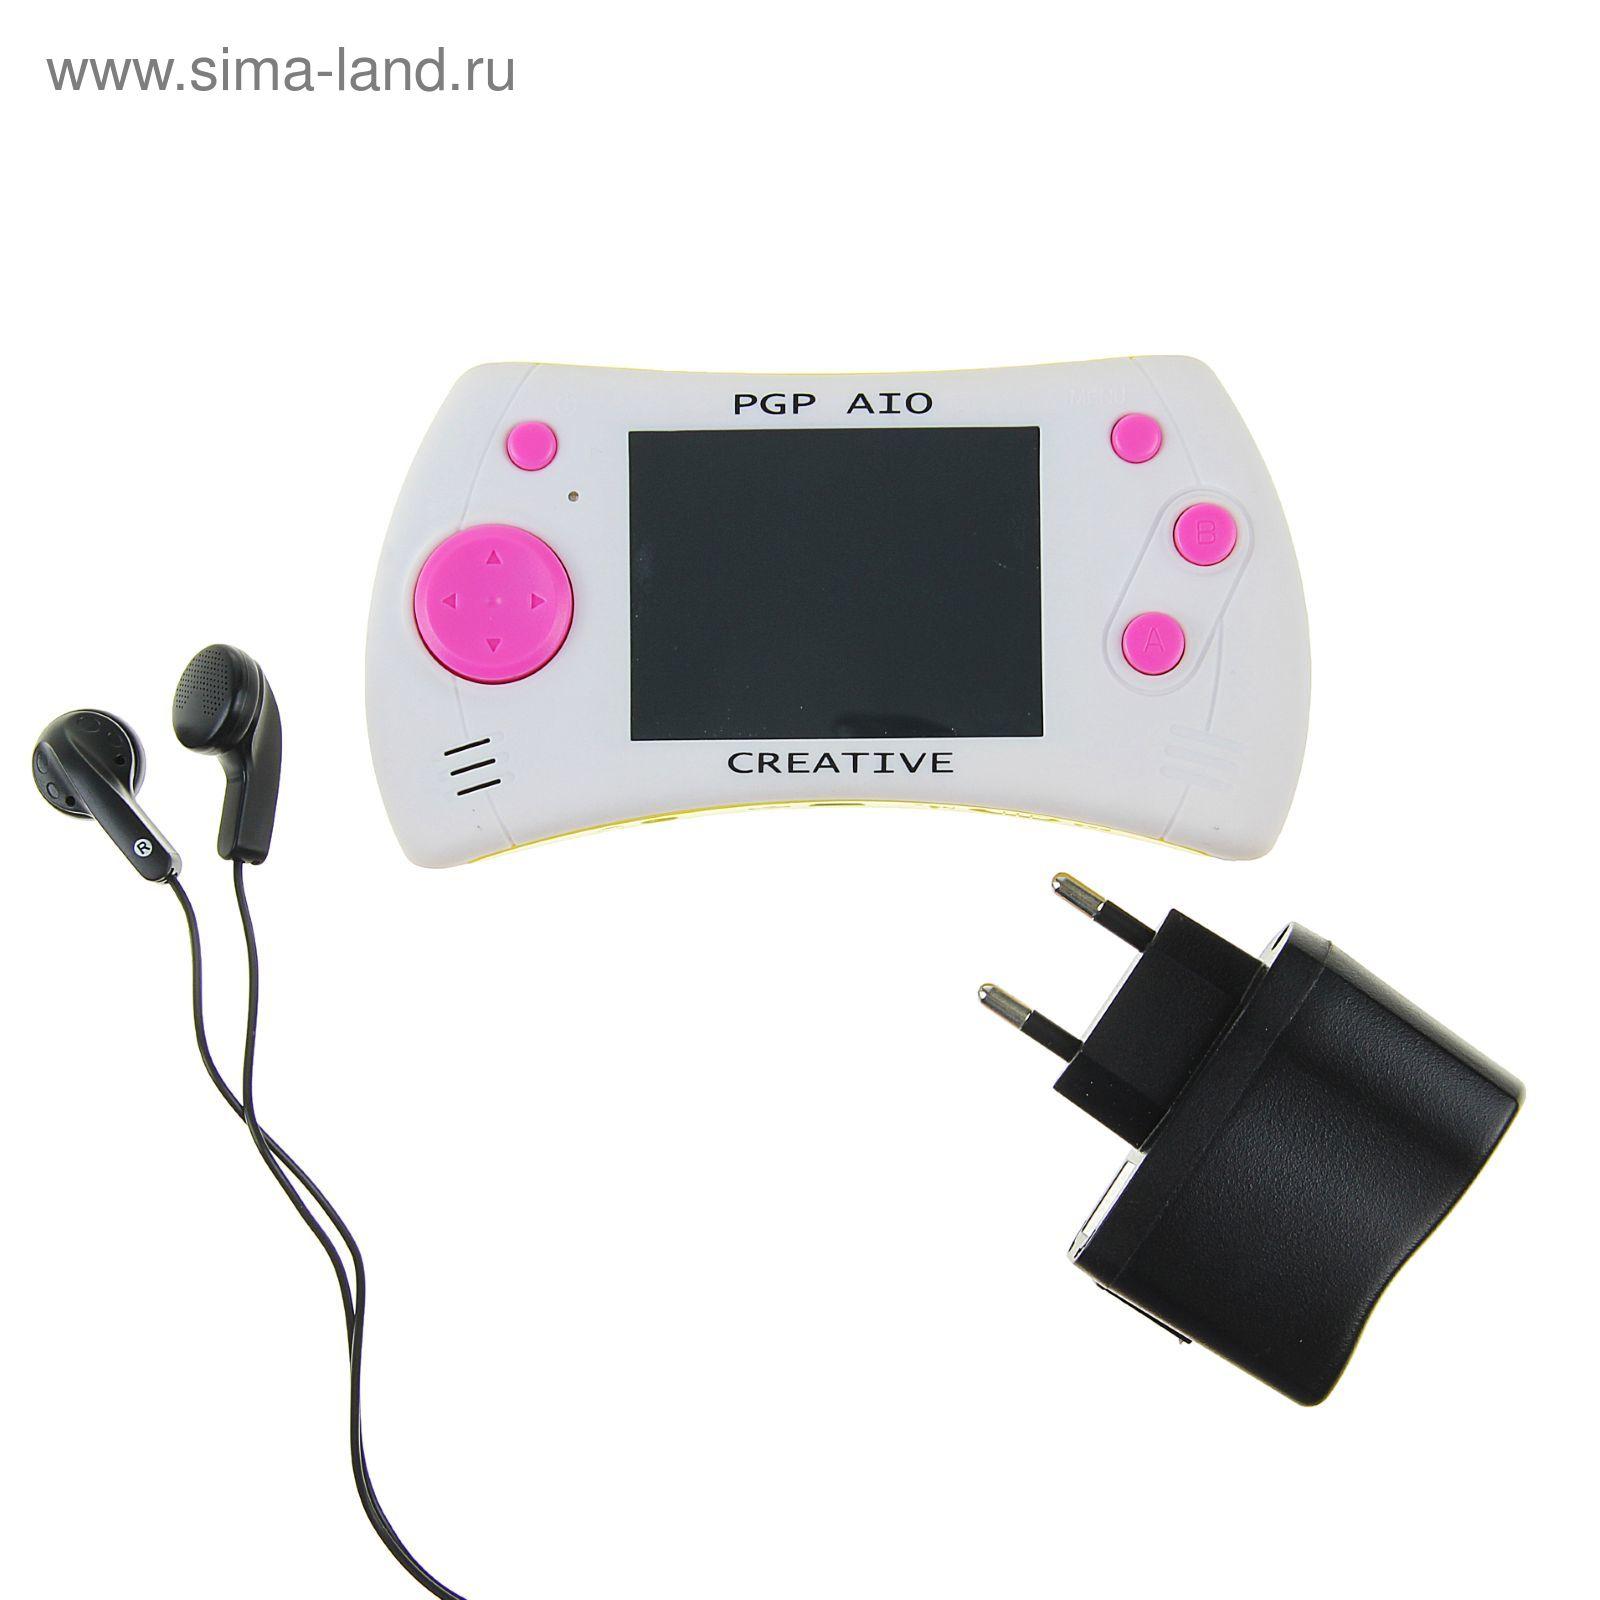 c4c6ea1896dea Игровая приставка PGP AIO Creative 2,8'' Touch, + 100 игр, 32 bit, белая